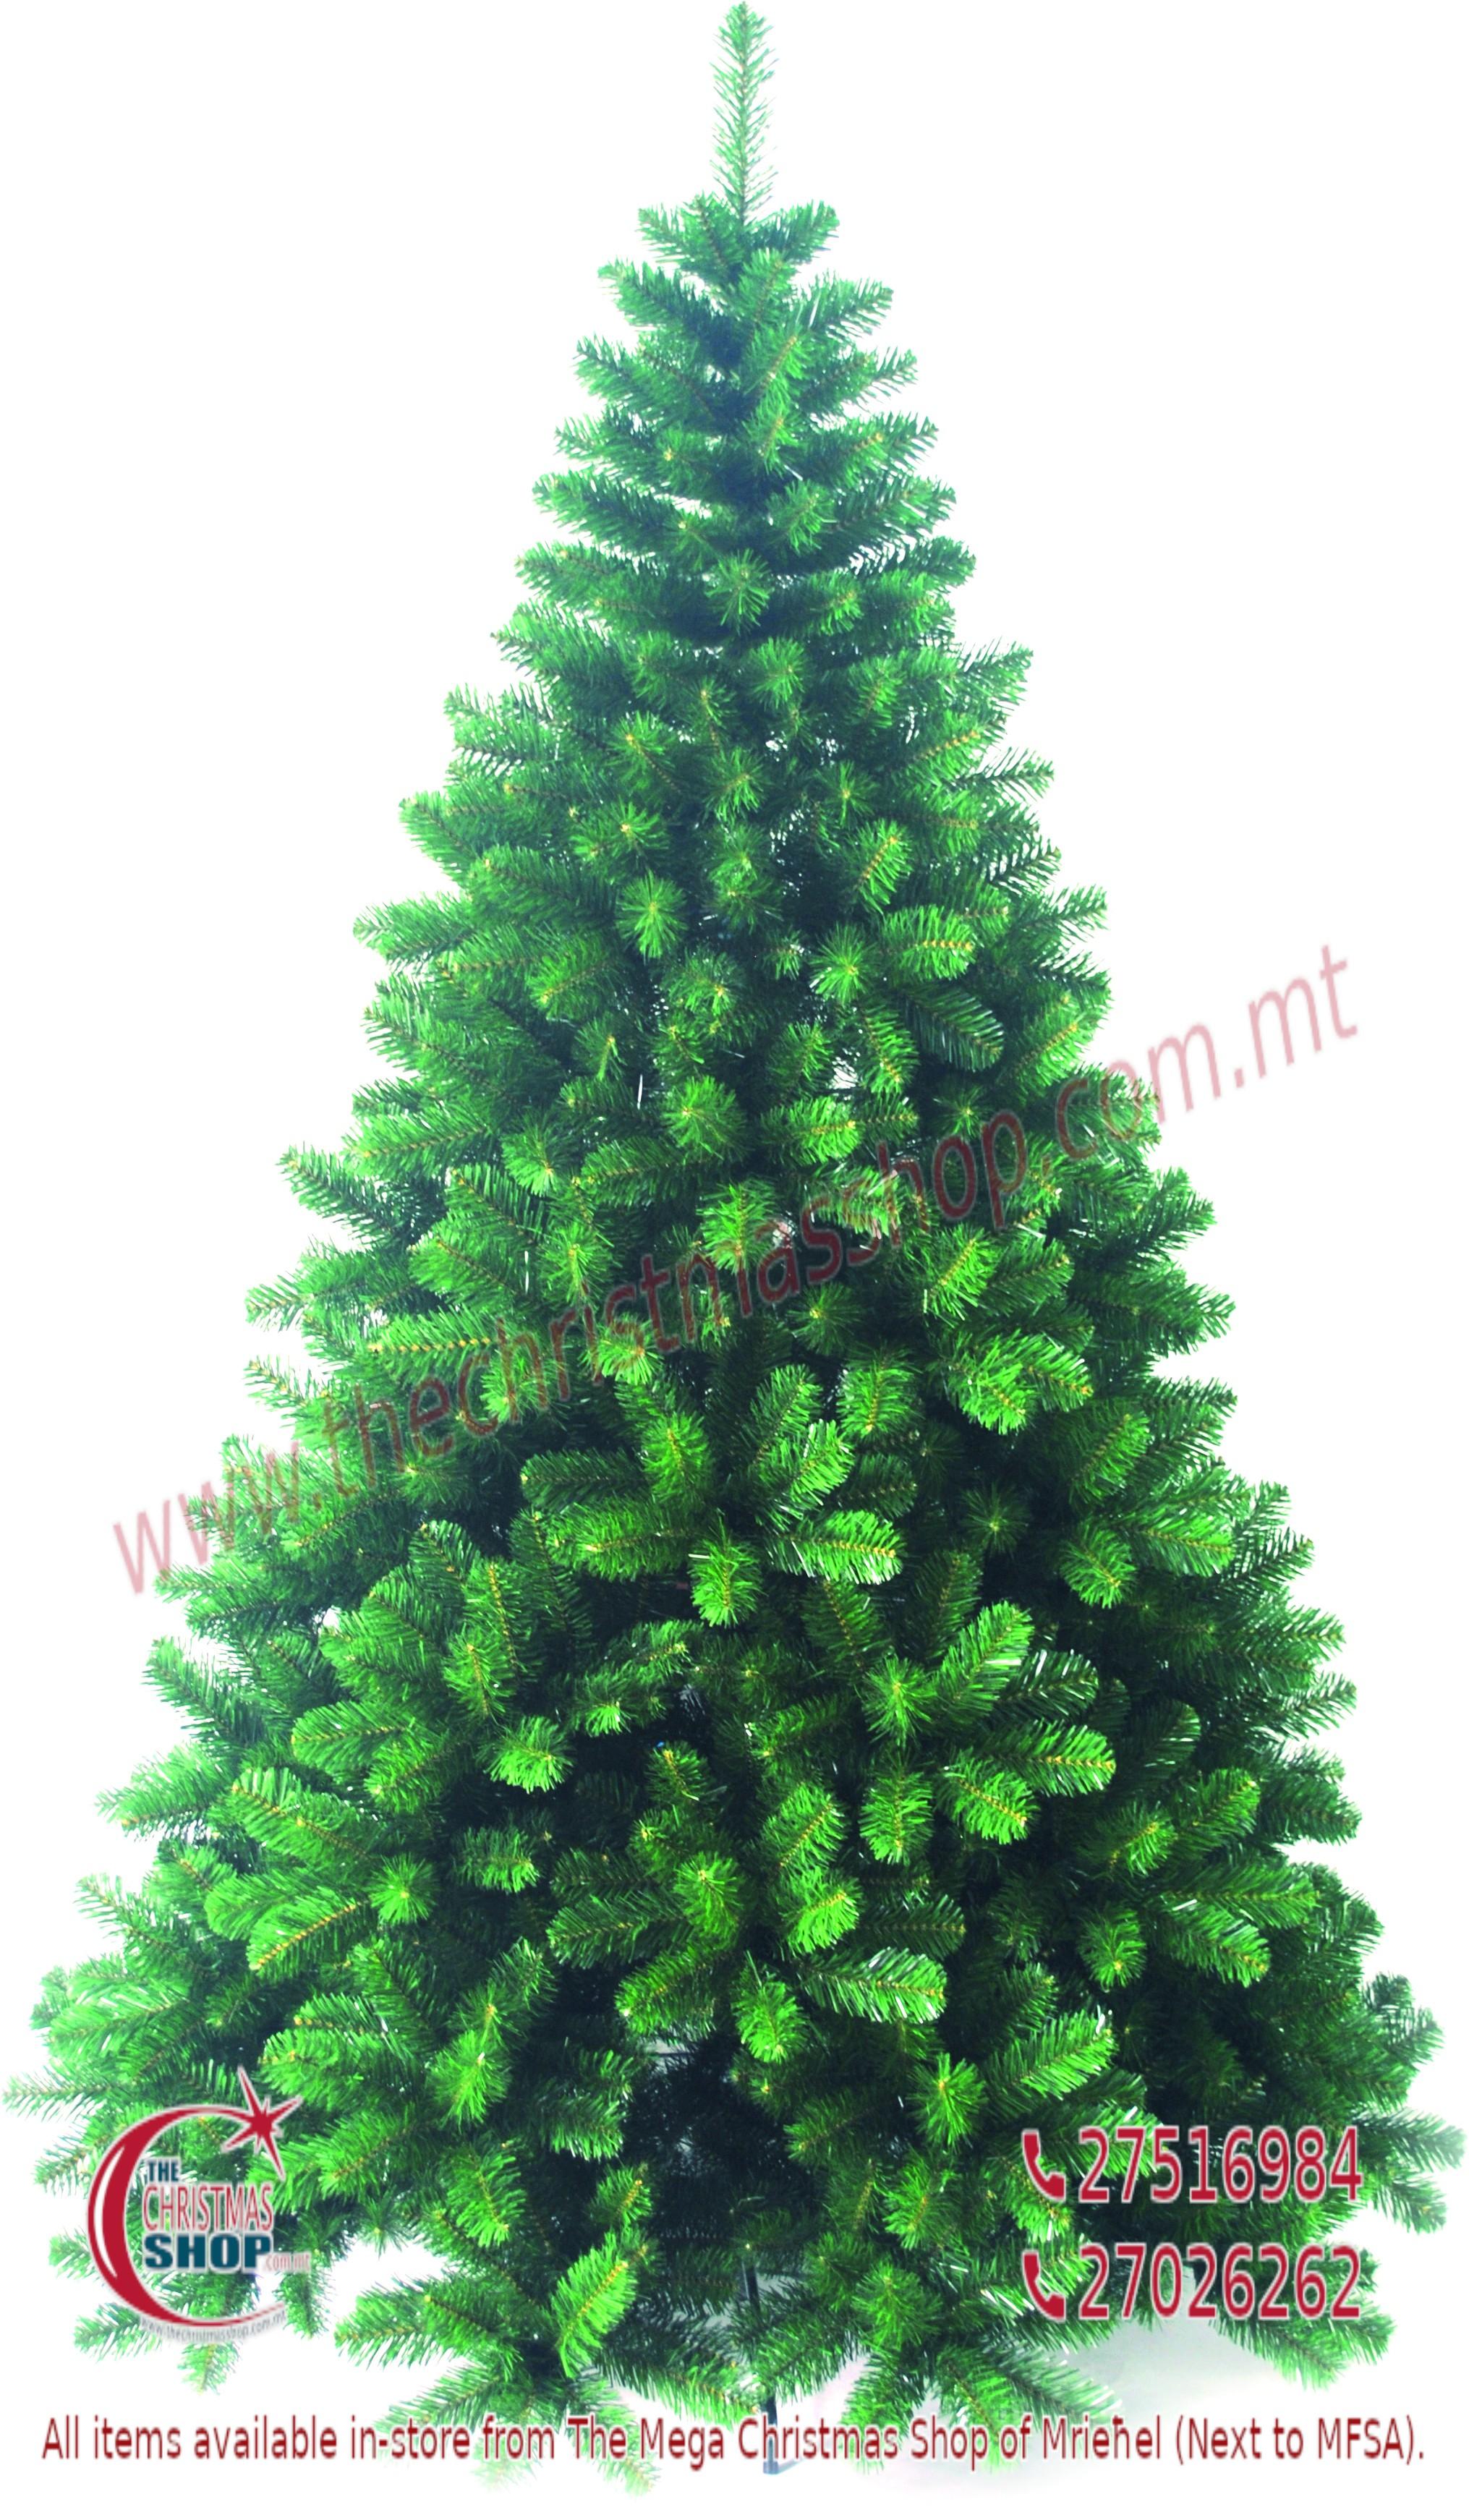 CHRISTMAS TREE MARILEVA VERDE 270CMS. PAR199473